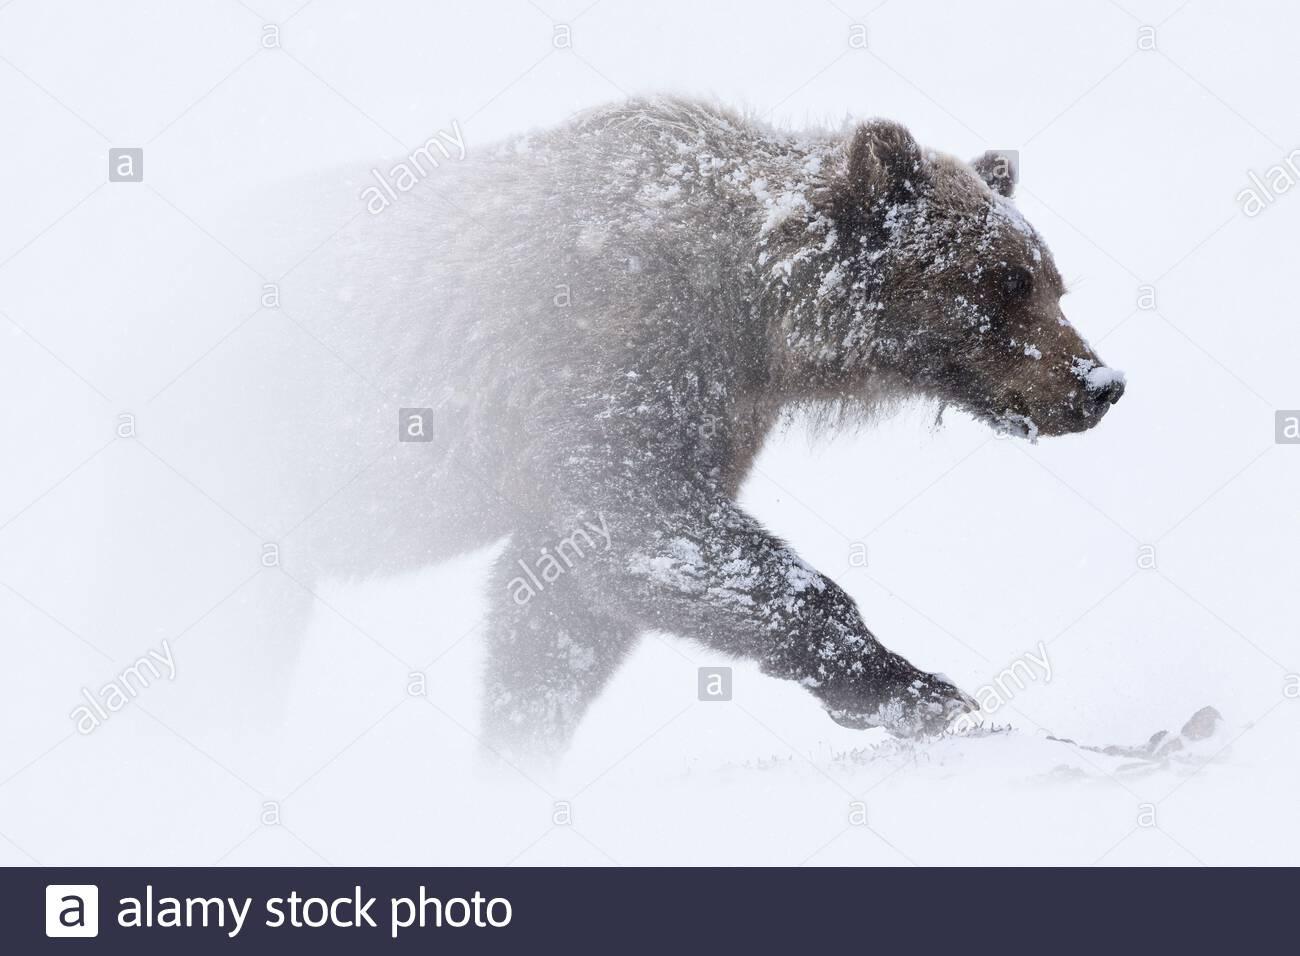 grizzly-bear-ursus-arctos-horribilis-fac